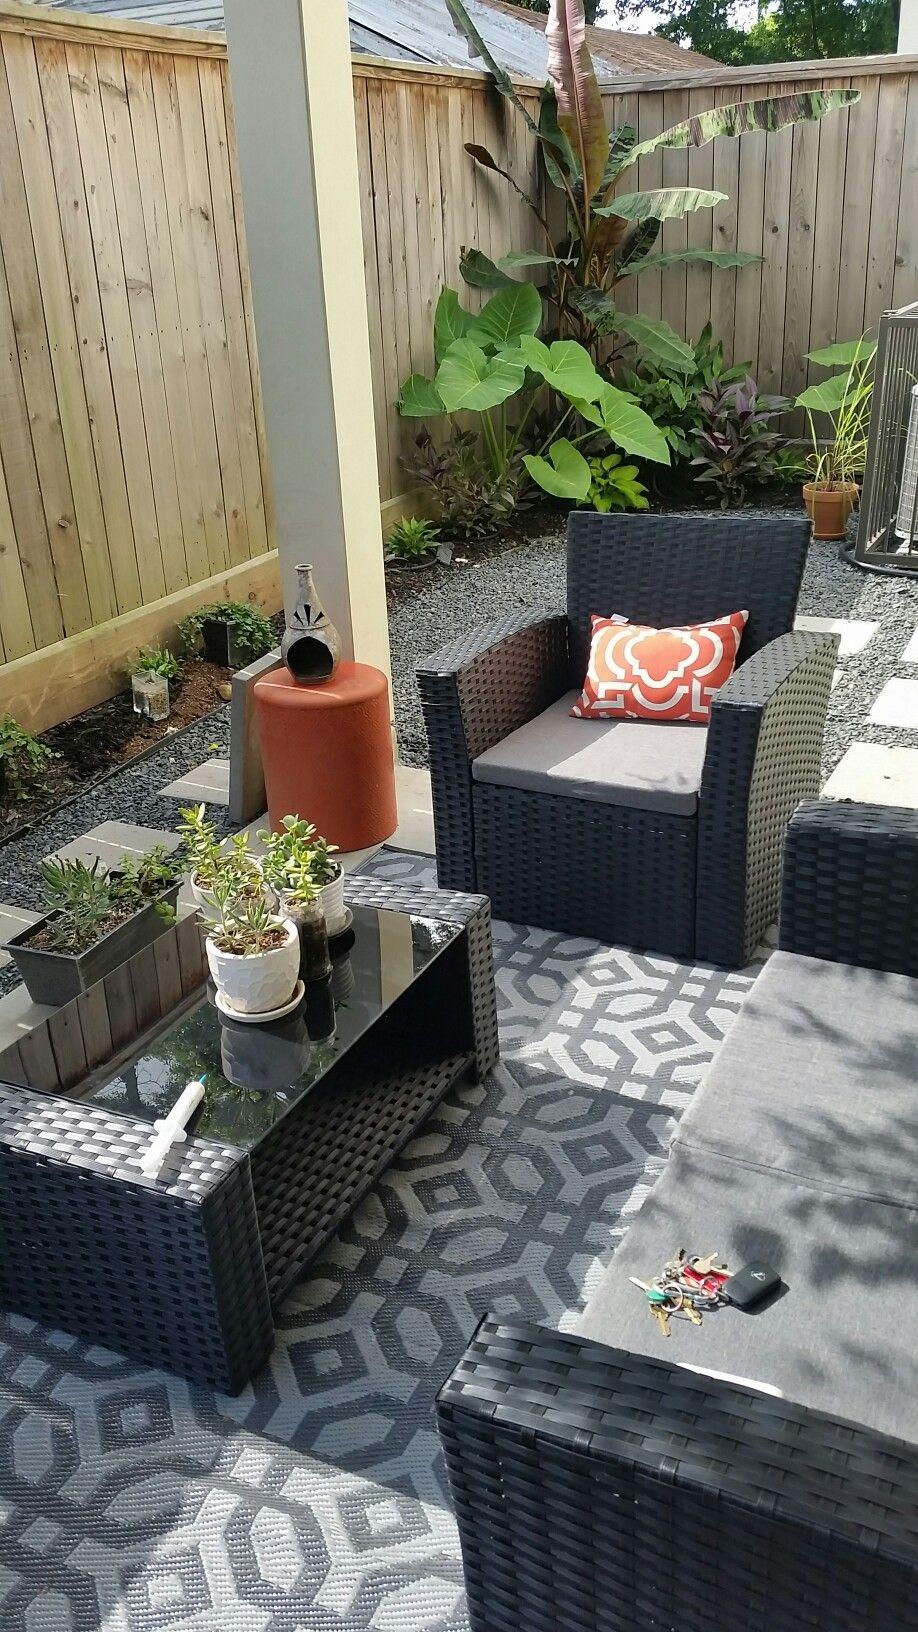 My backyard zen transformation | Outdoor decor, Outdoor ... on My Garden Outdoor Living  id=58240